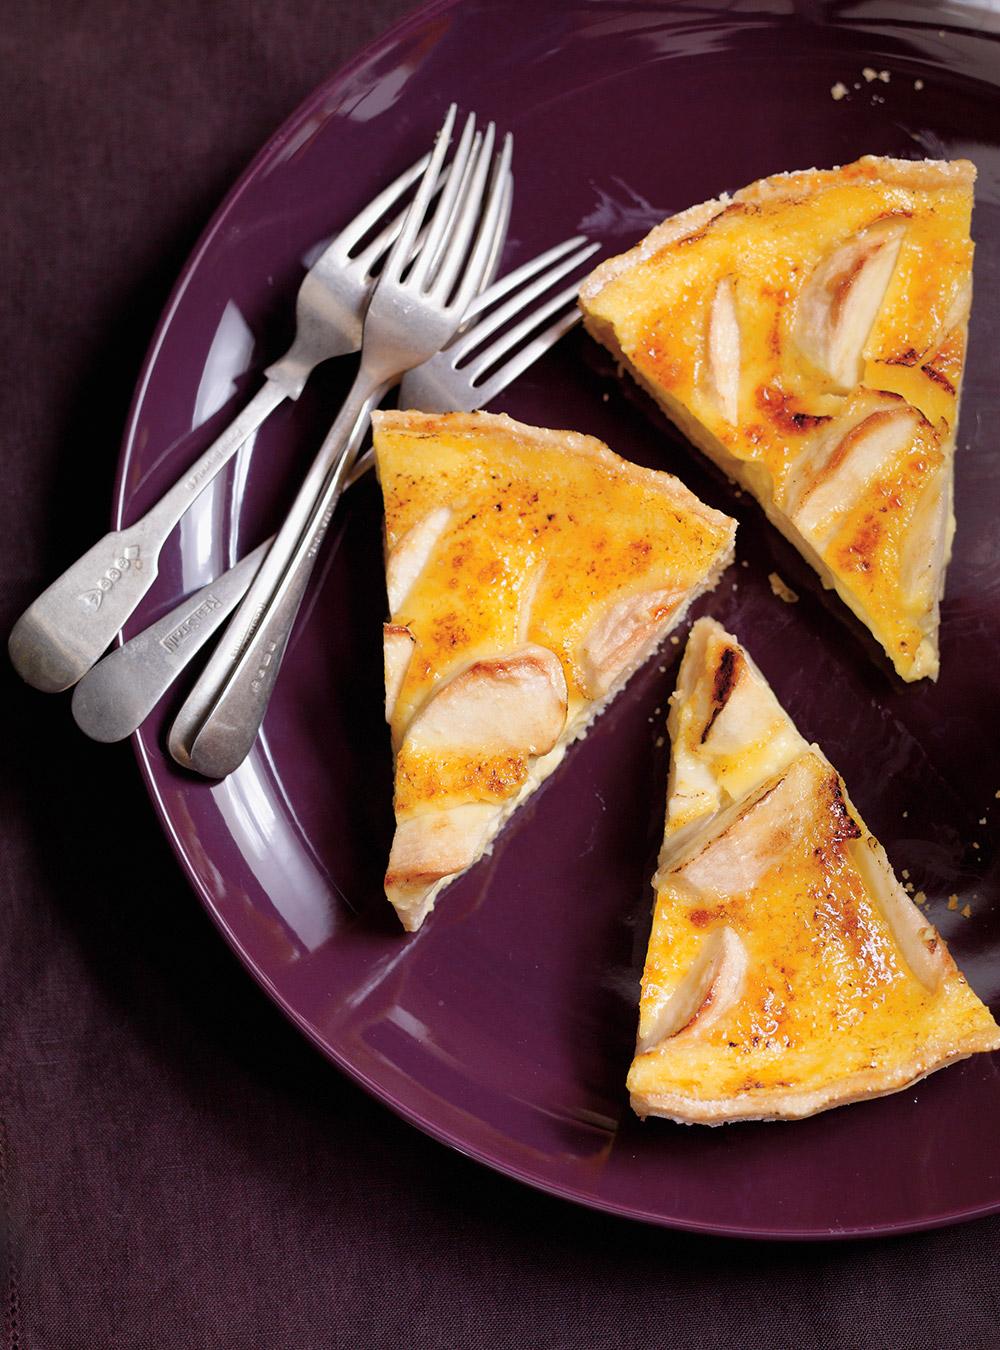 Tarte crème brûlée aux pommes | ricardo